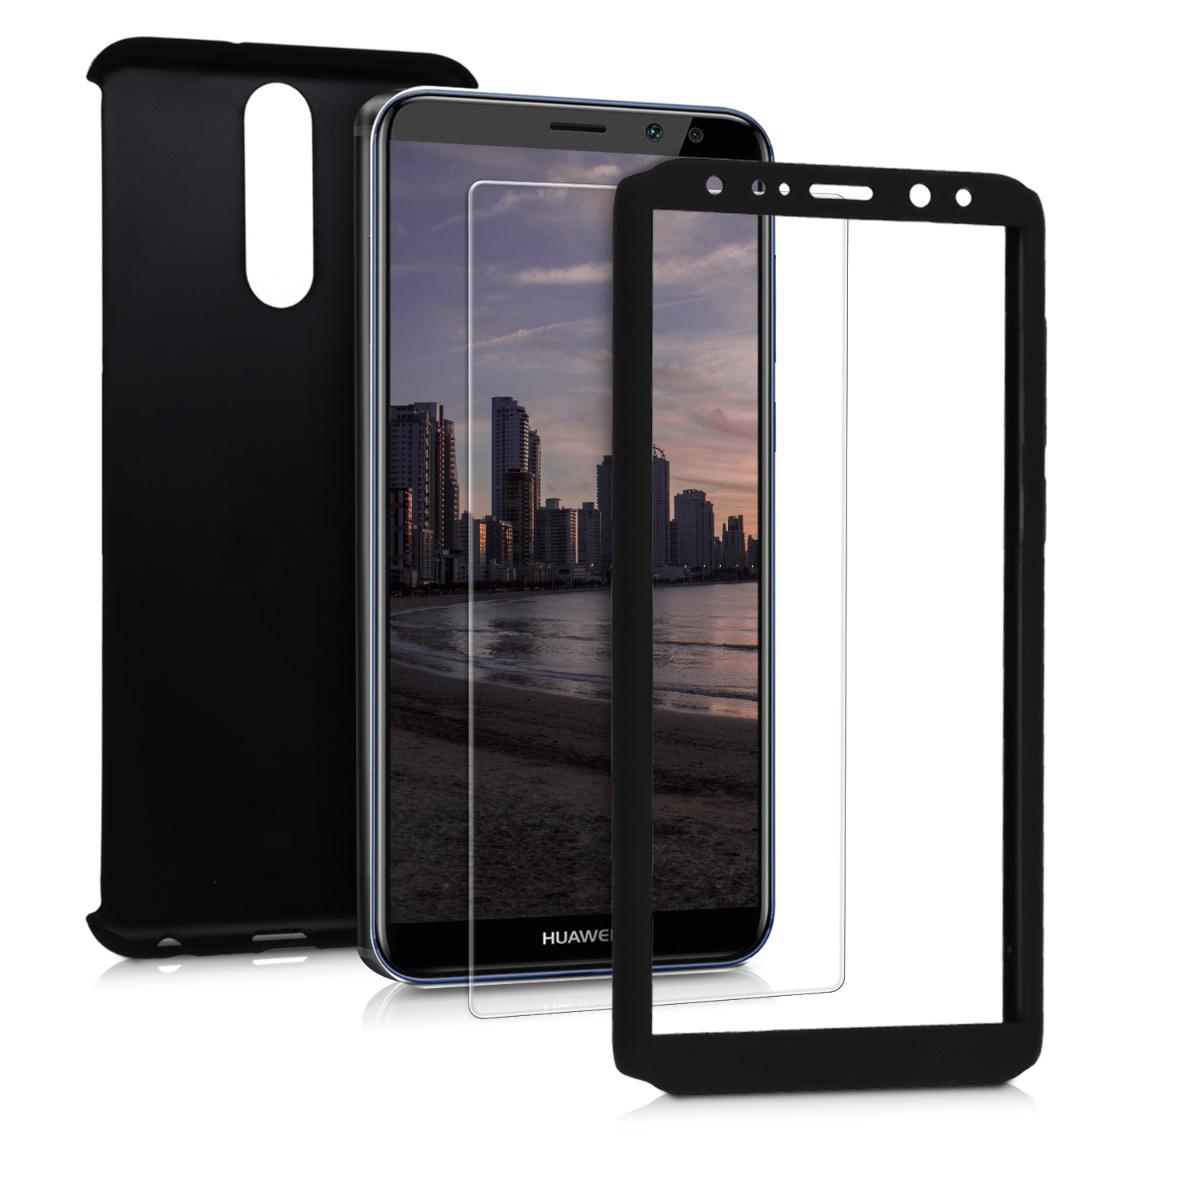 KW Θήκη Full Body για Huawei Mate 10 Lite & Tempered Glass - Metallic Black (44968.68)